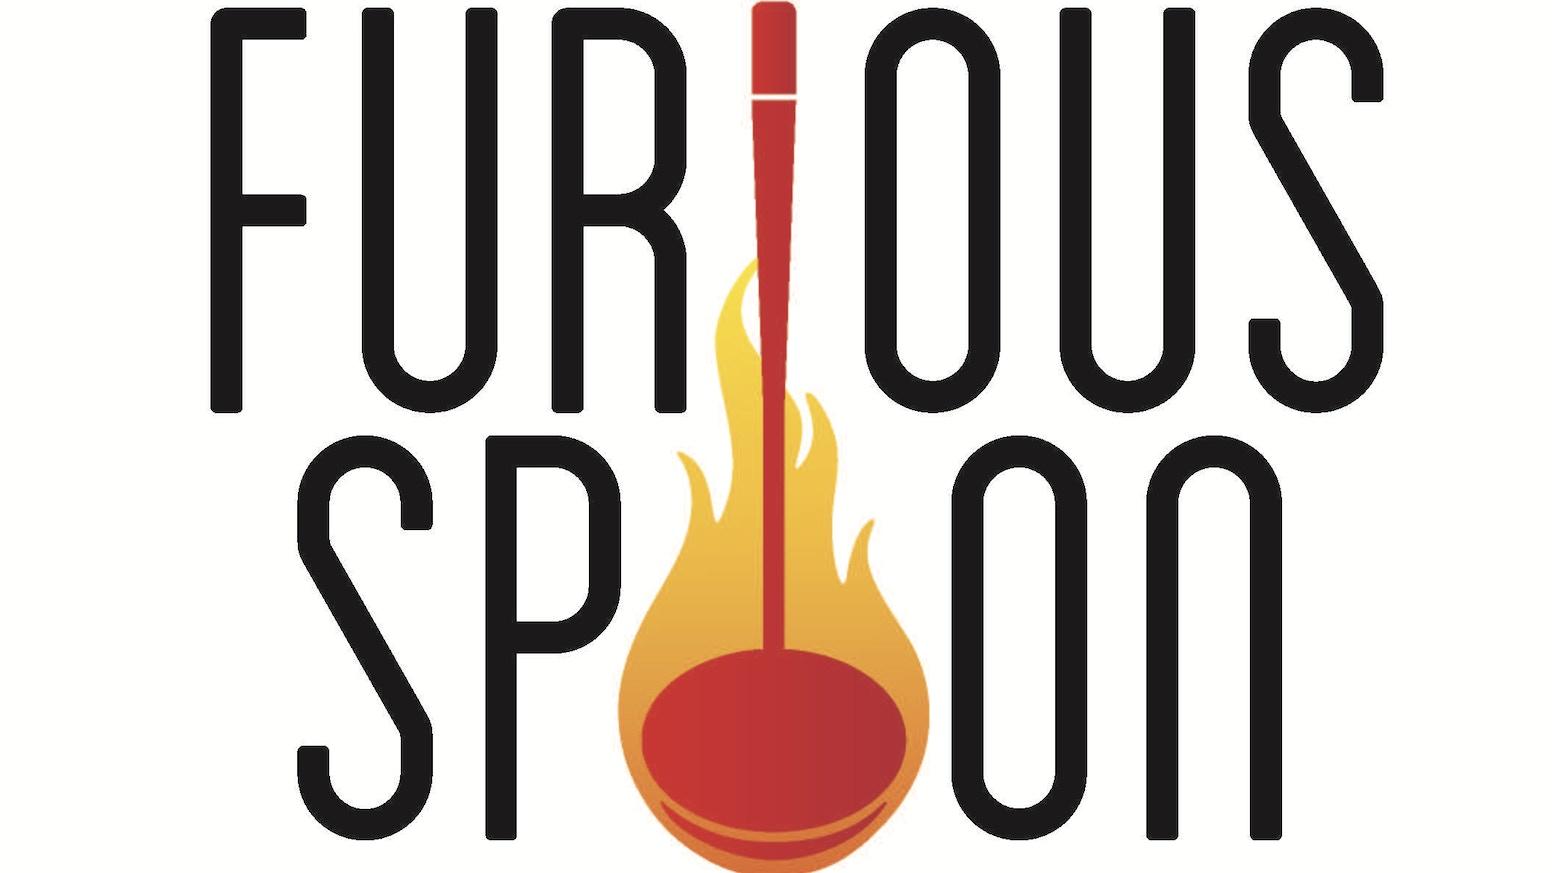 Furious Spoon by Shin Thompson — Kickstarter